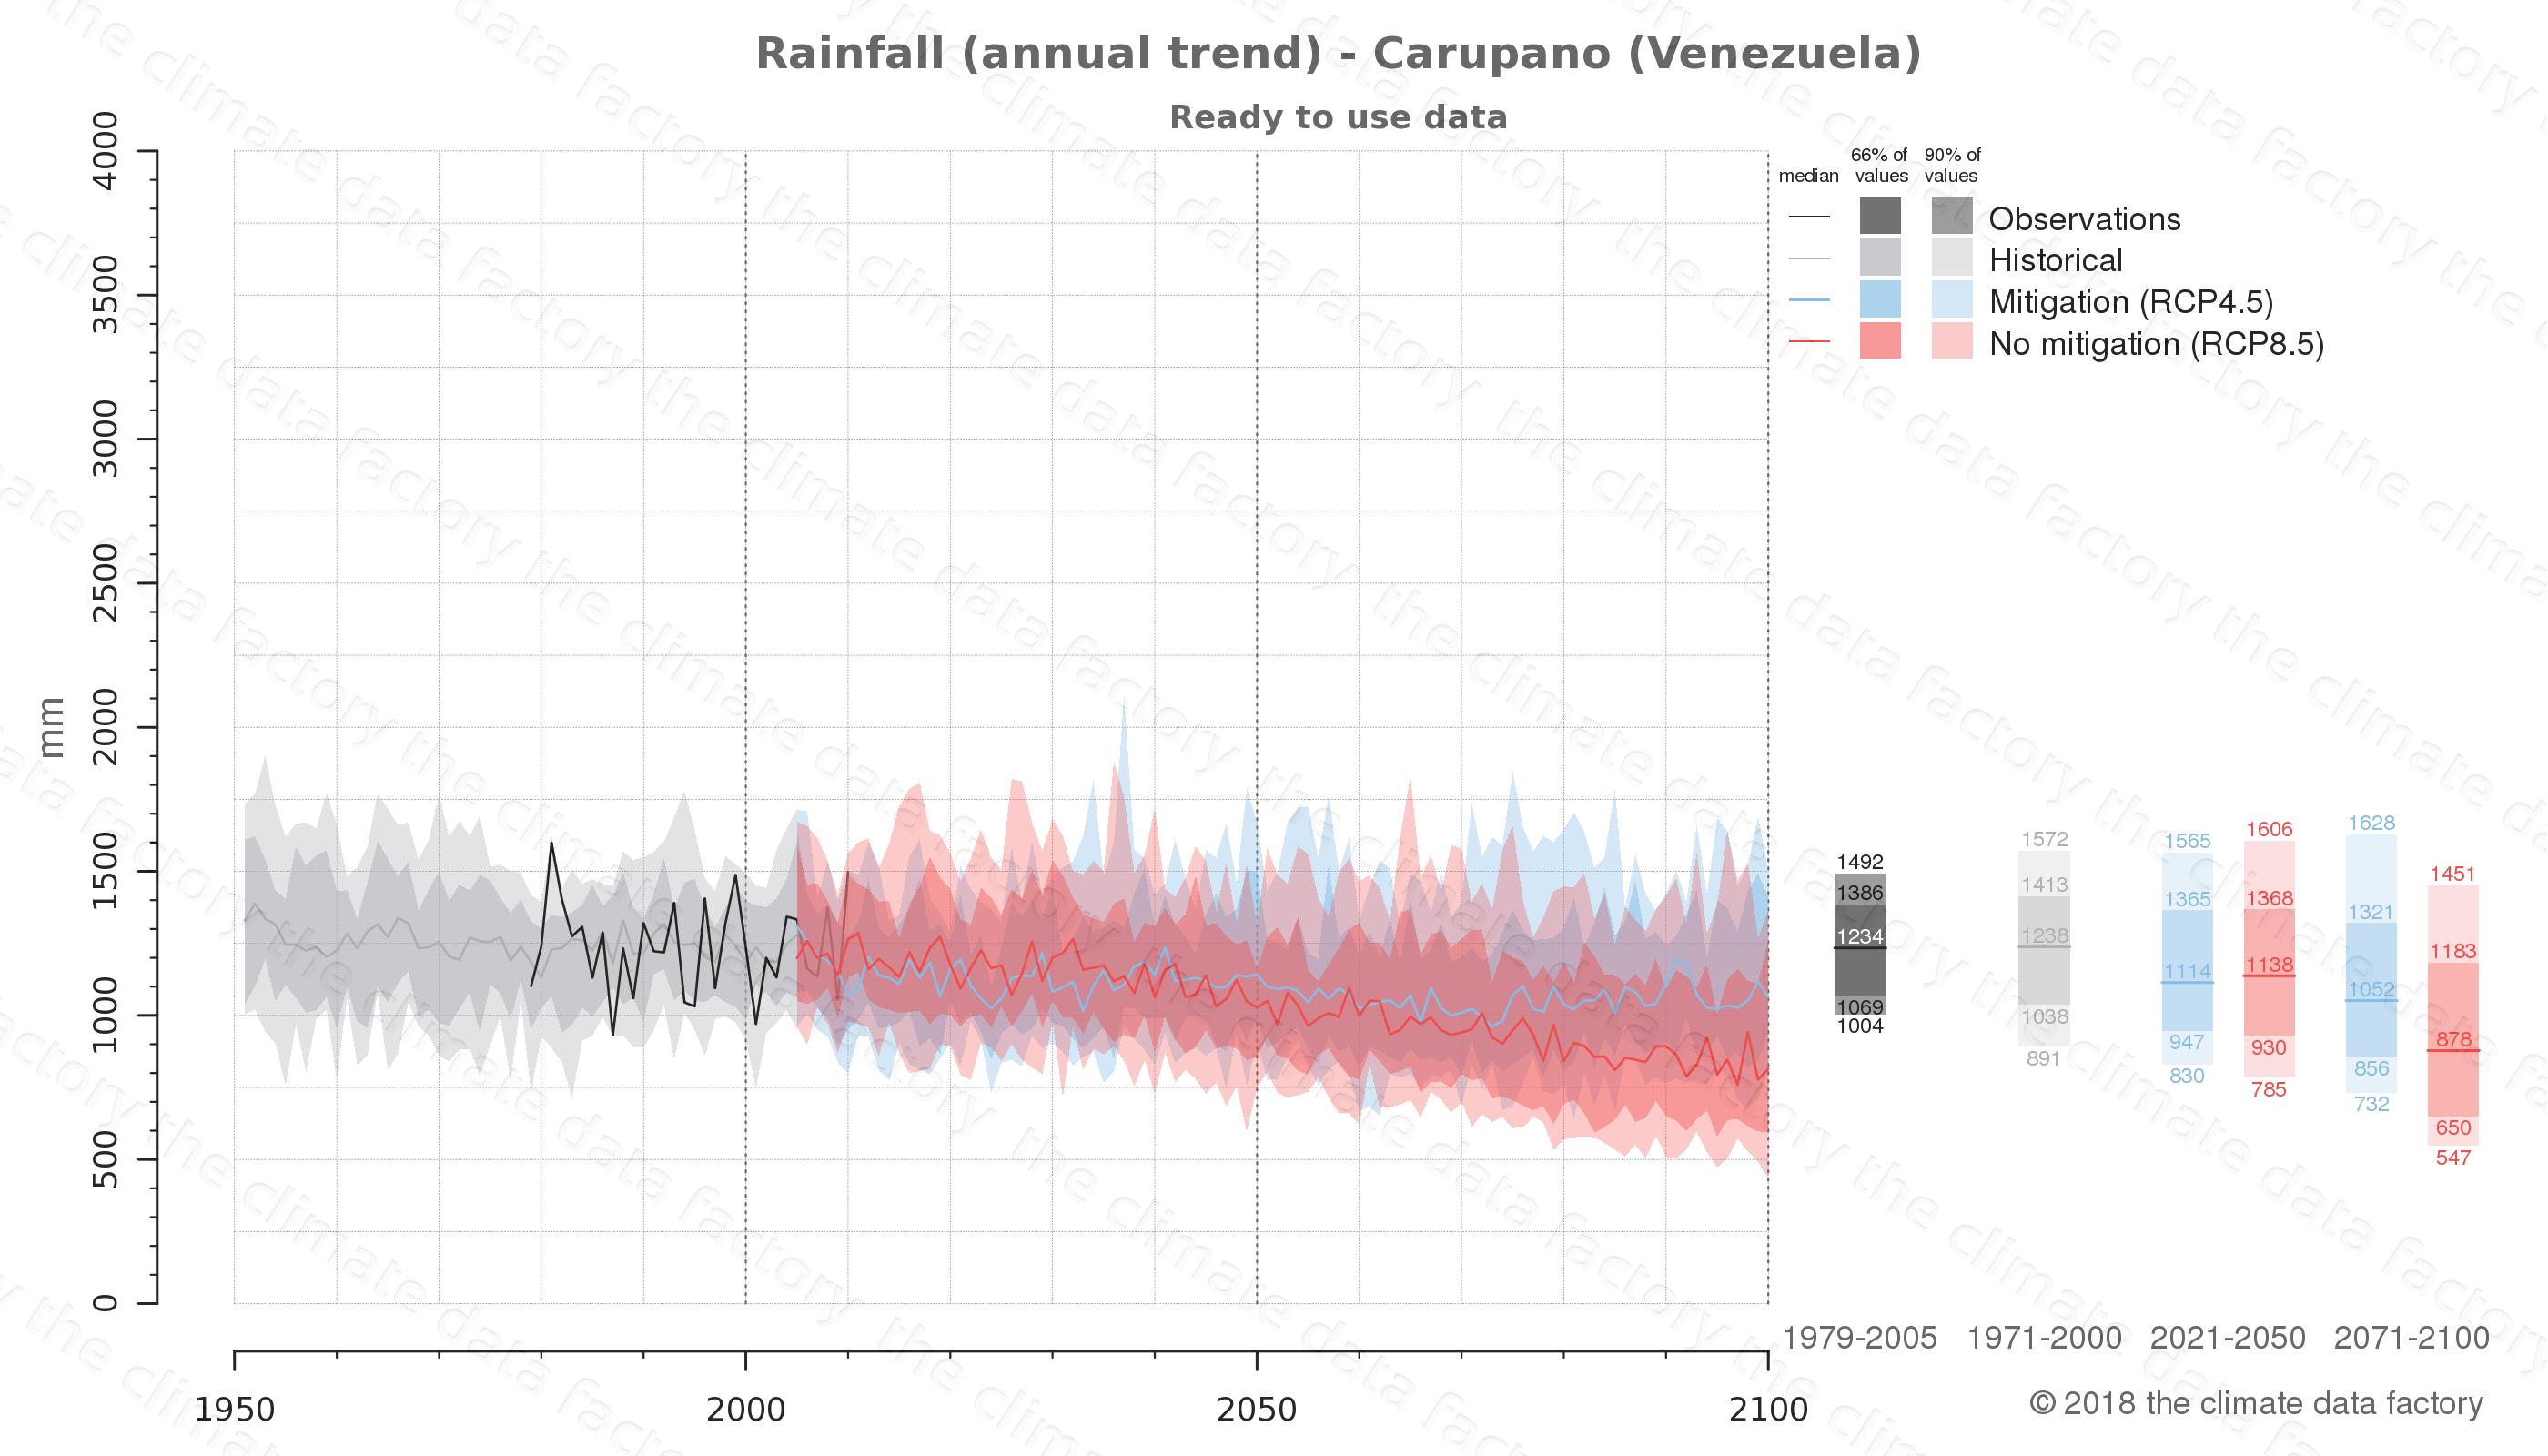 climate change data policy adaptation climate graph city data rainfall carupano venezuela